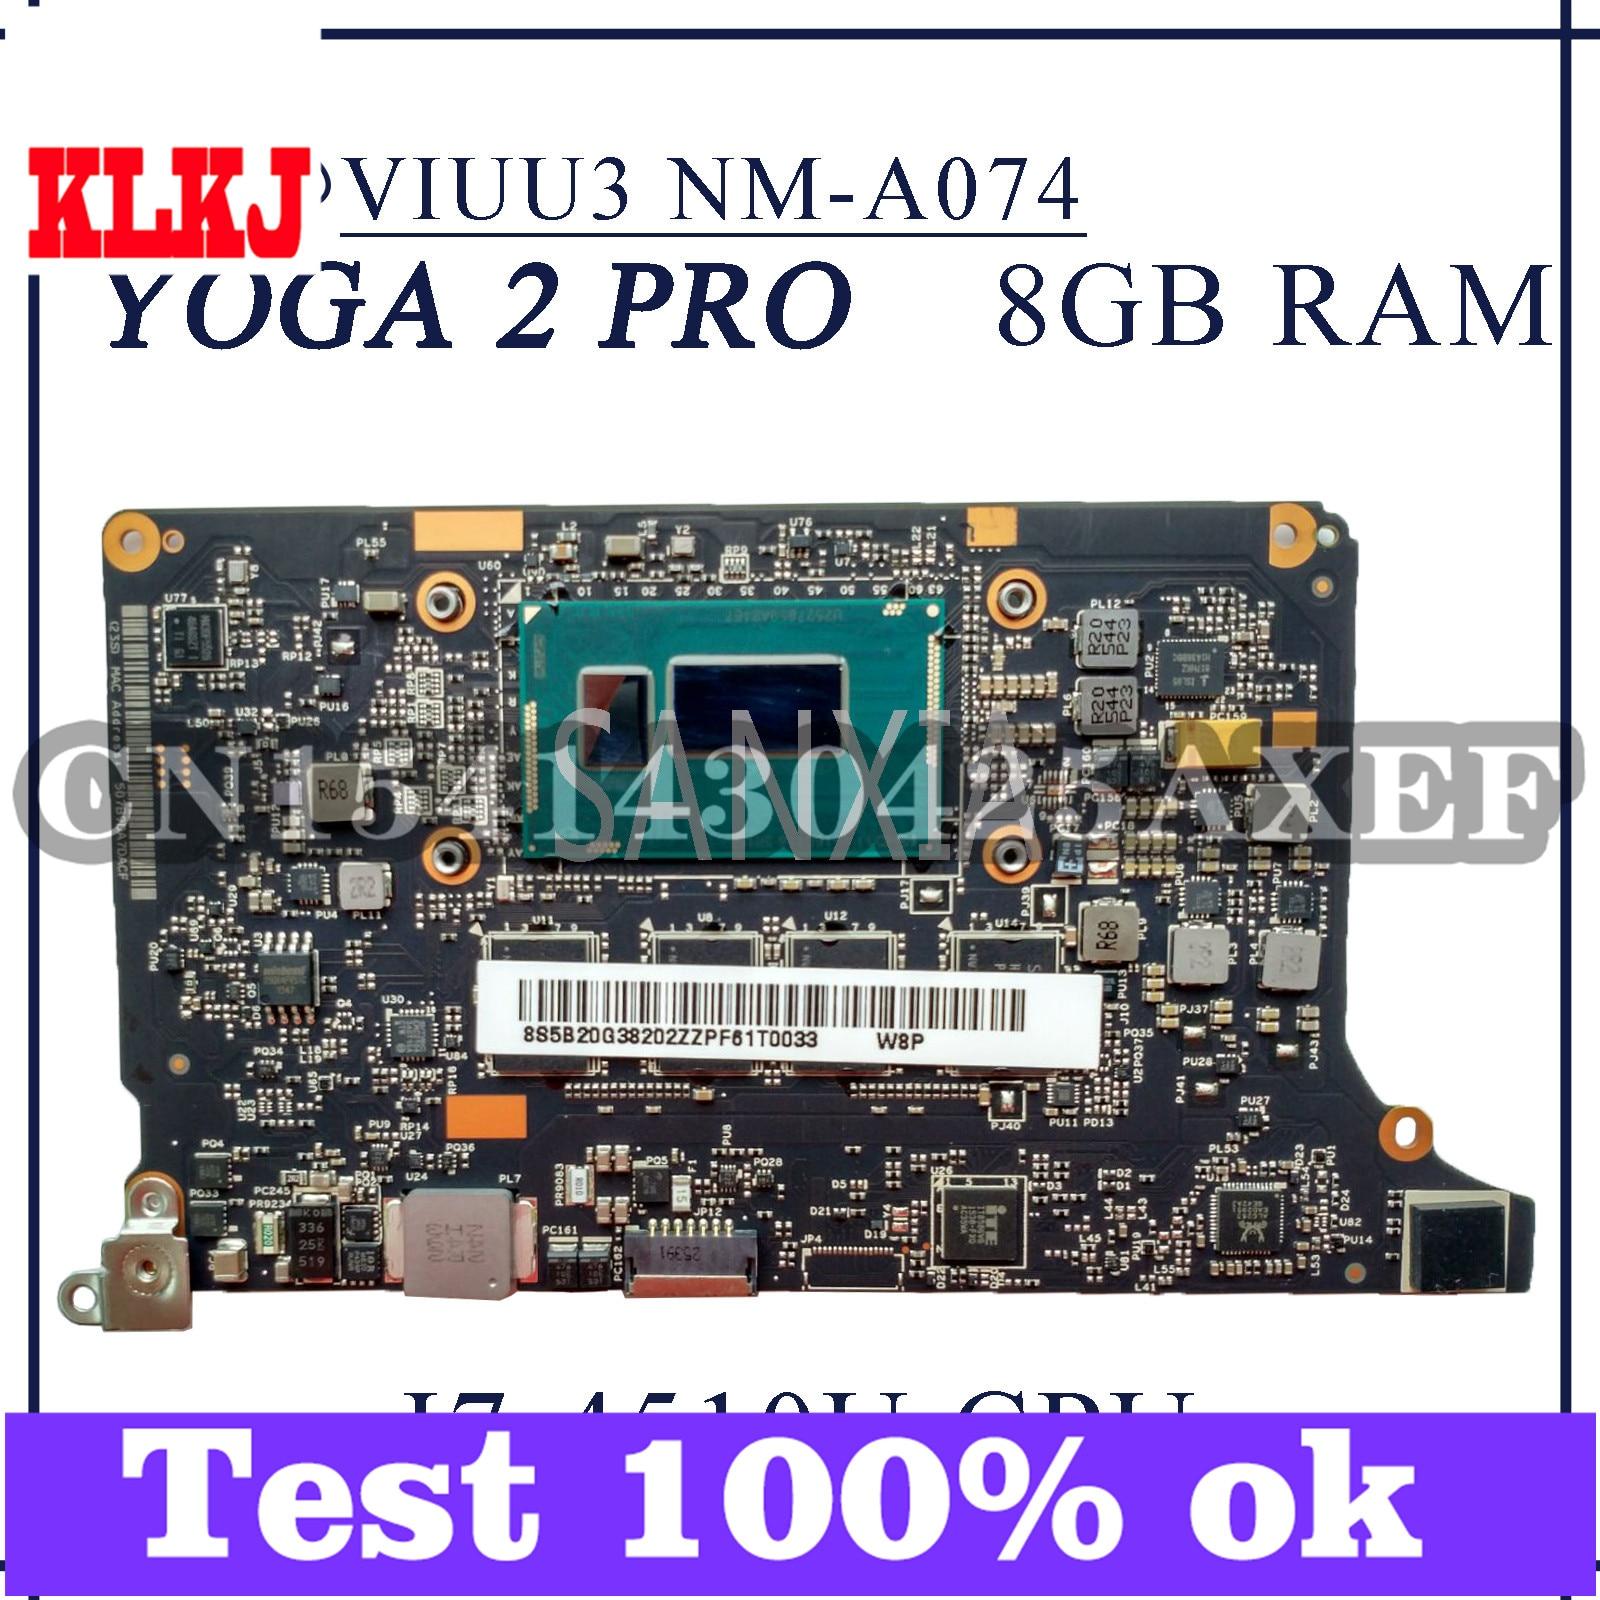 KLKJ NM-A074 اللوحة الأم للكمبيوتر المحمول لينوفو اليوغا 2 برو الأصلي اللوحة الرئيسية 8GB-RAM I7-4510U/4500U وحدة المعالجة المركزية